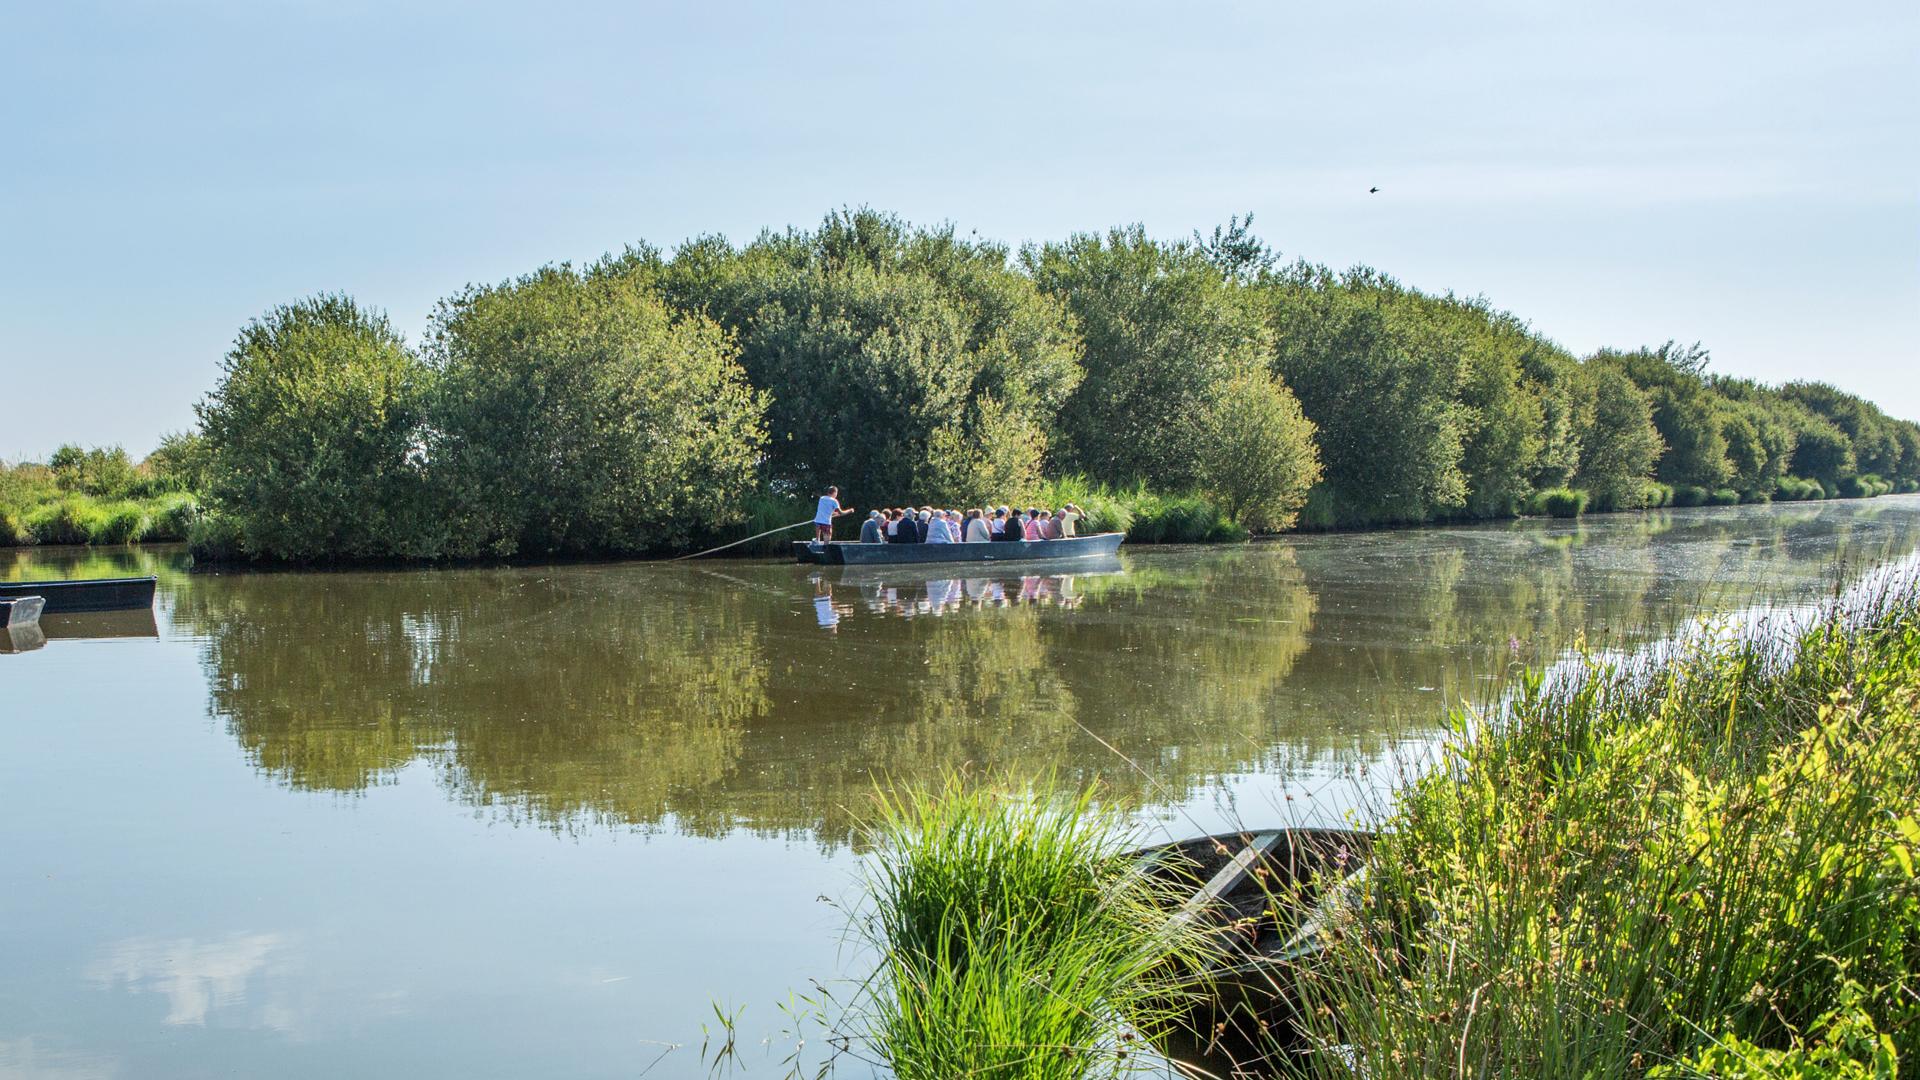 Afbeeldingsresultaat voor parc naturel régional de la Brière